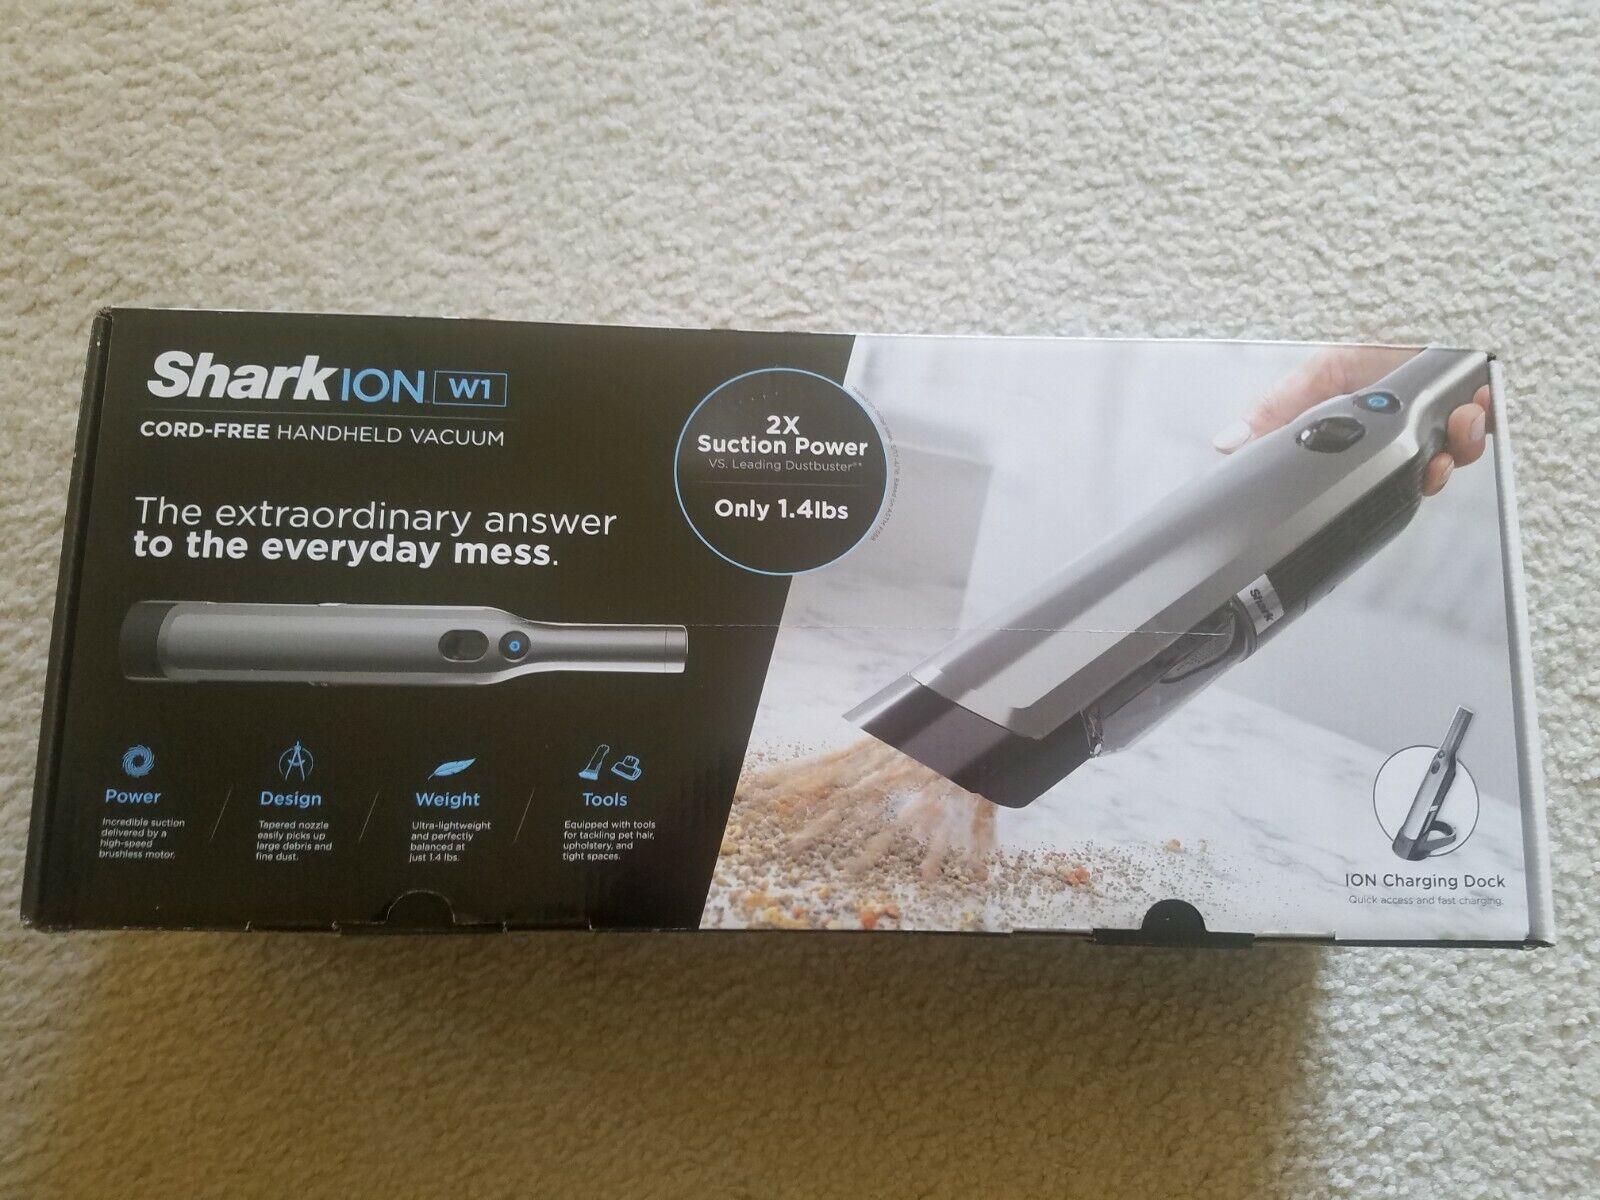 Shark Ninja Ion W1 Cord-Free Handheld Vacuum Brand New Free Ship